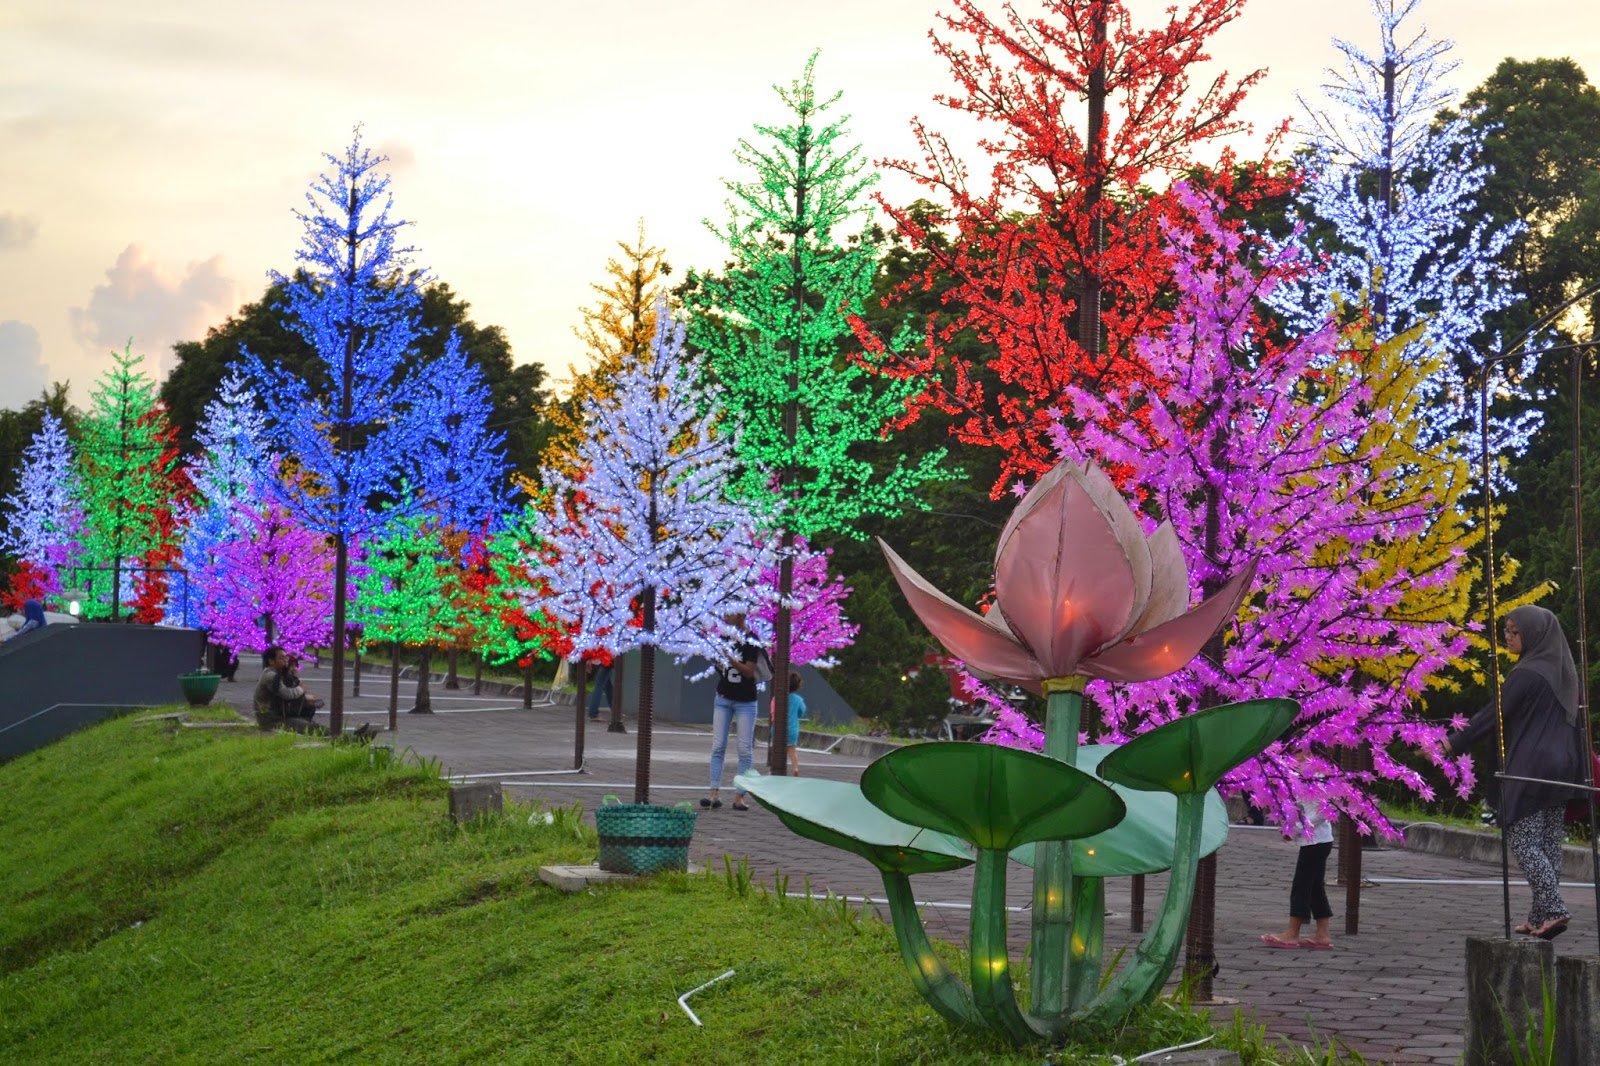 Taman Pelangi Yogyakarta Wisata Malam 1000 Lampion Romantis Ngehits Backpacker